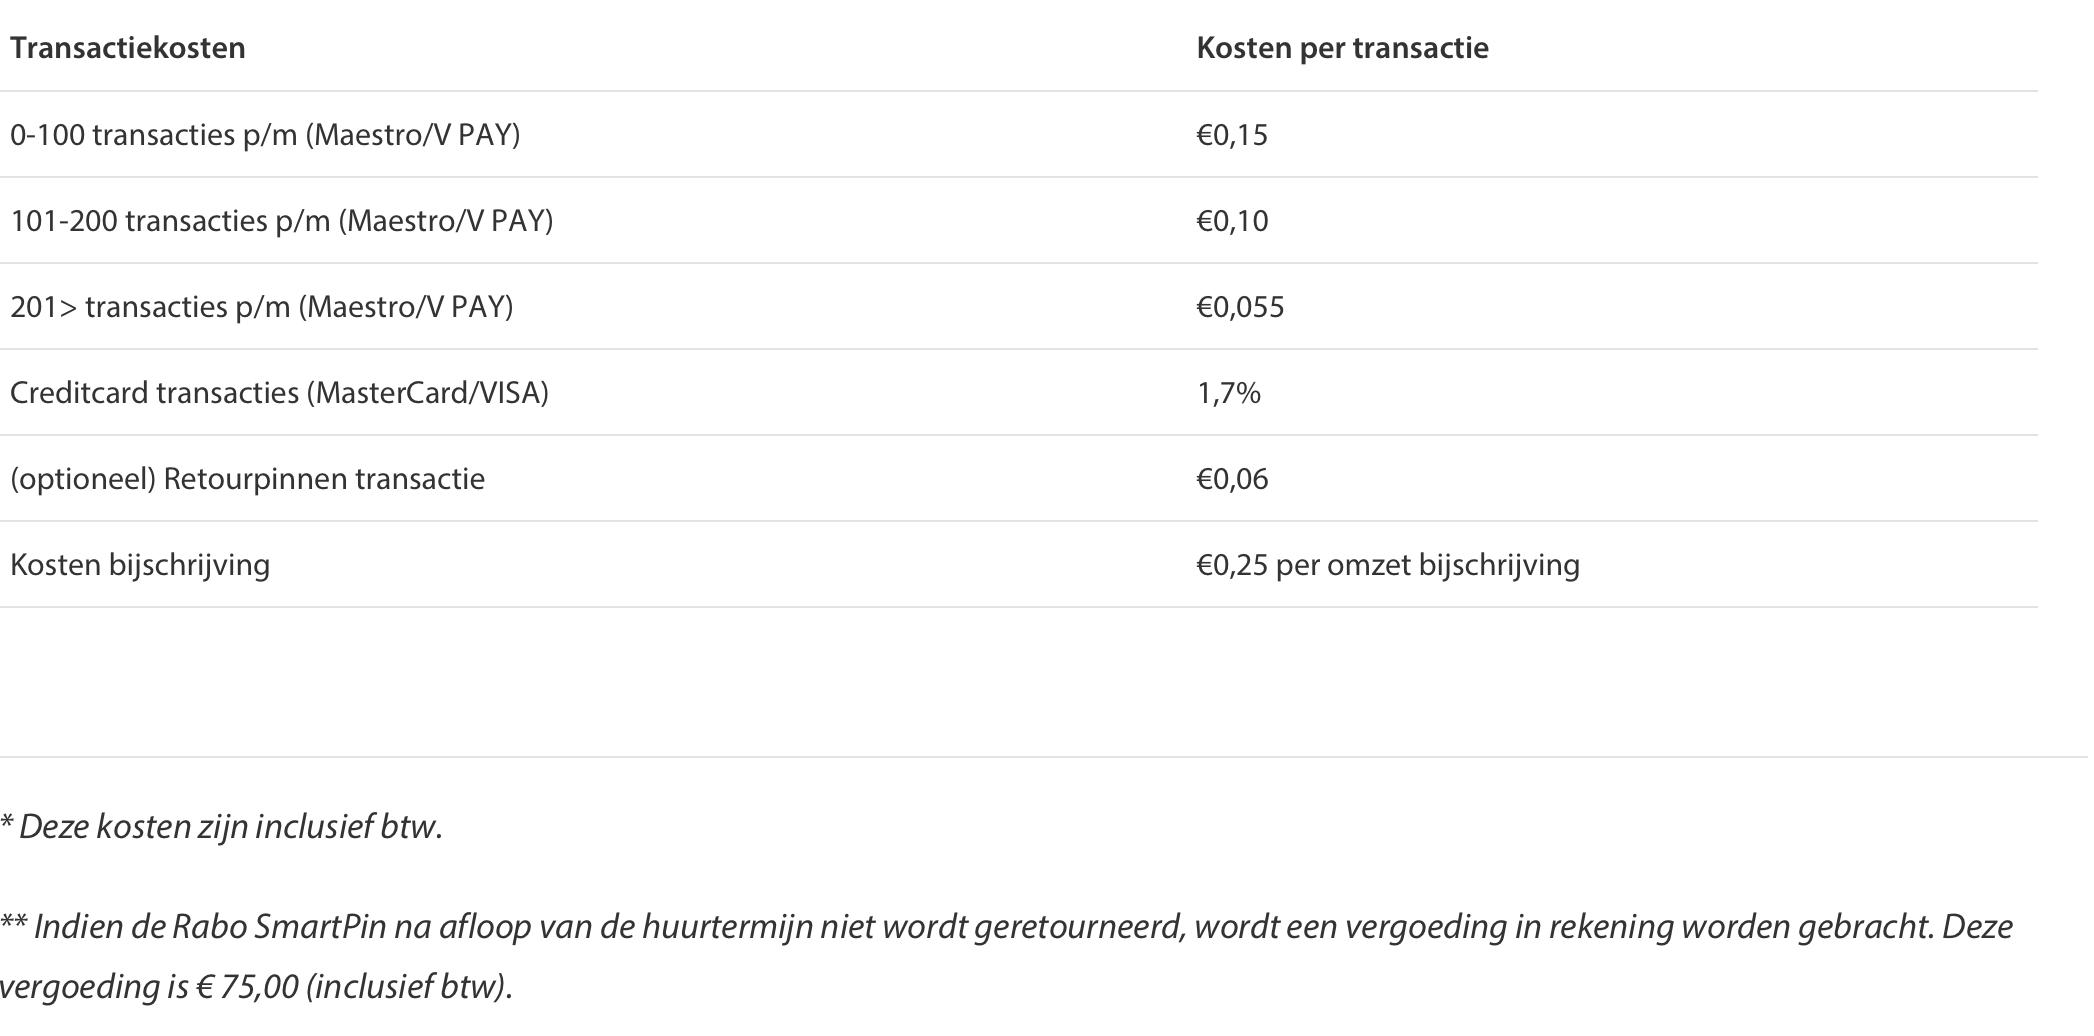 Transactiekosten Rabo SmartPin